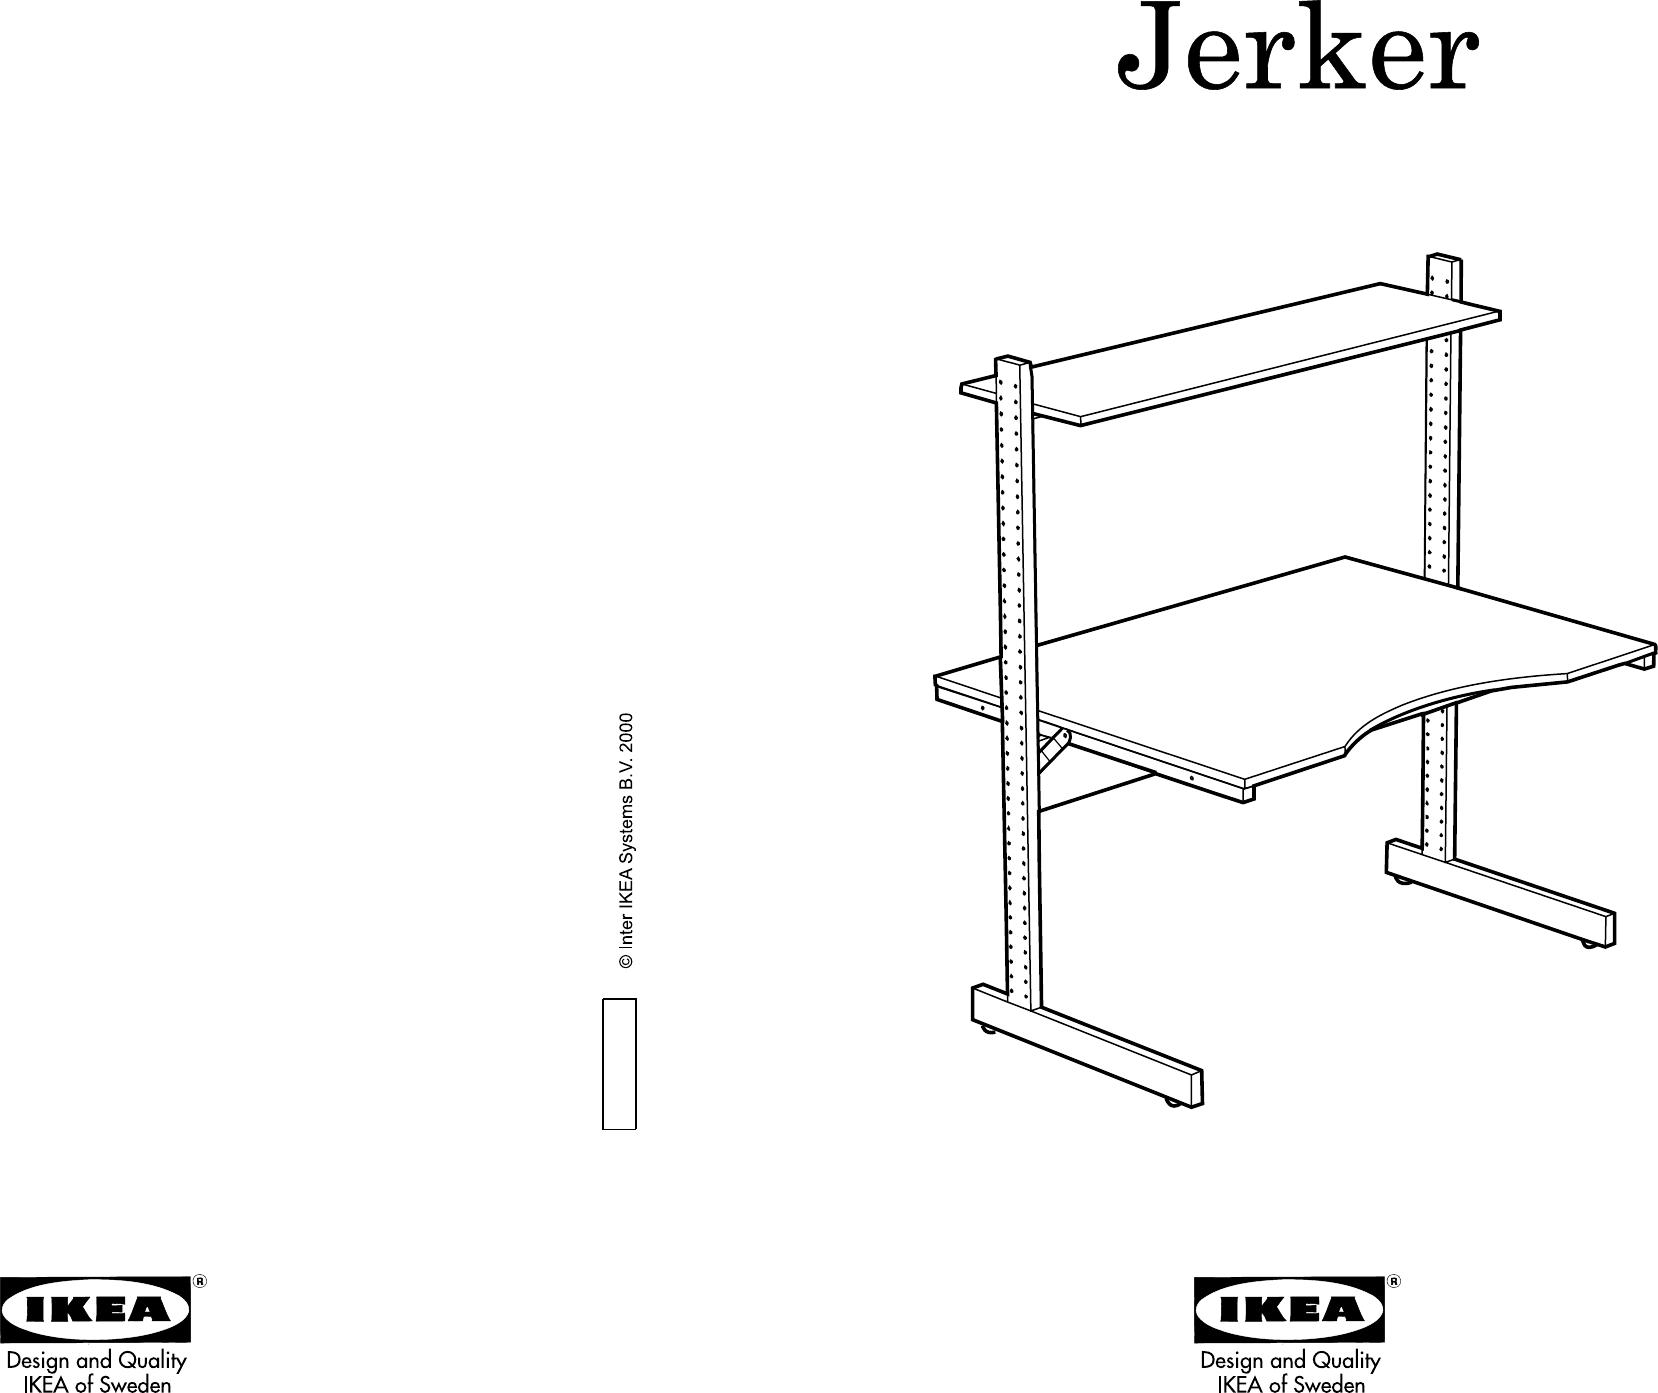 Ikea Jerker Manual